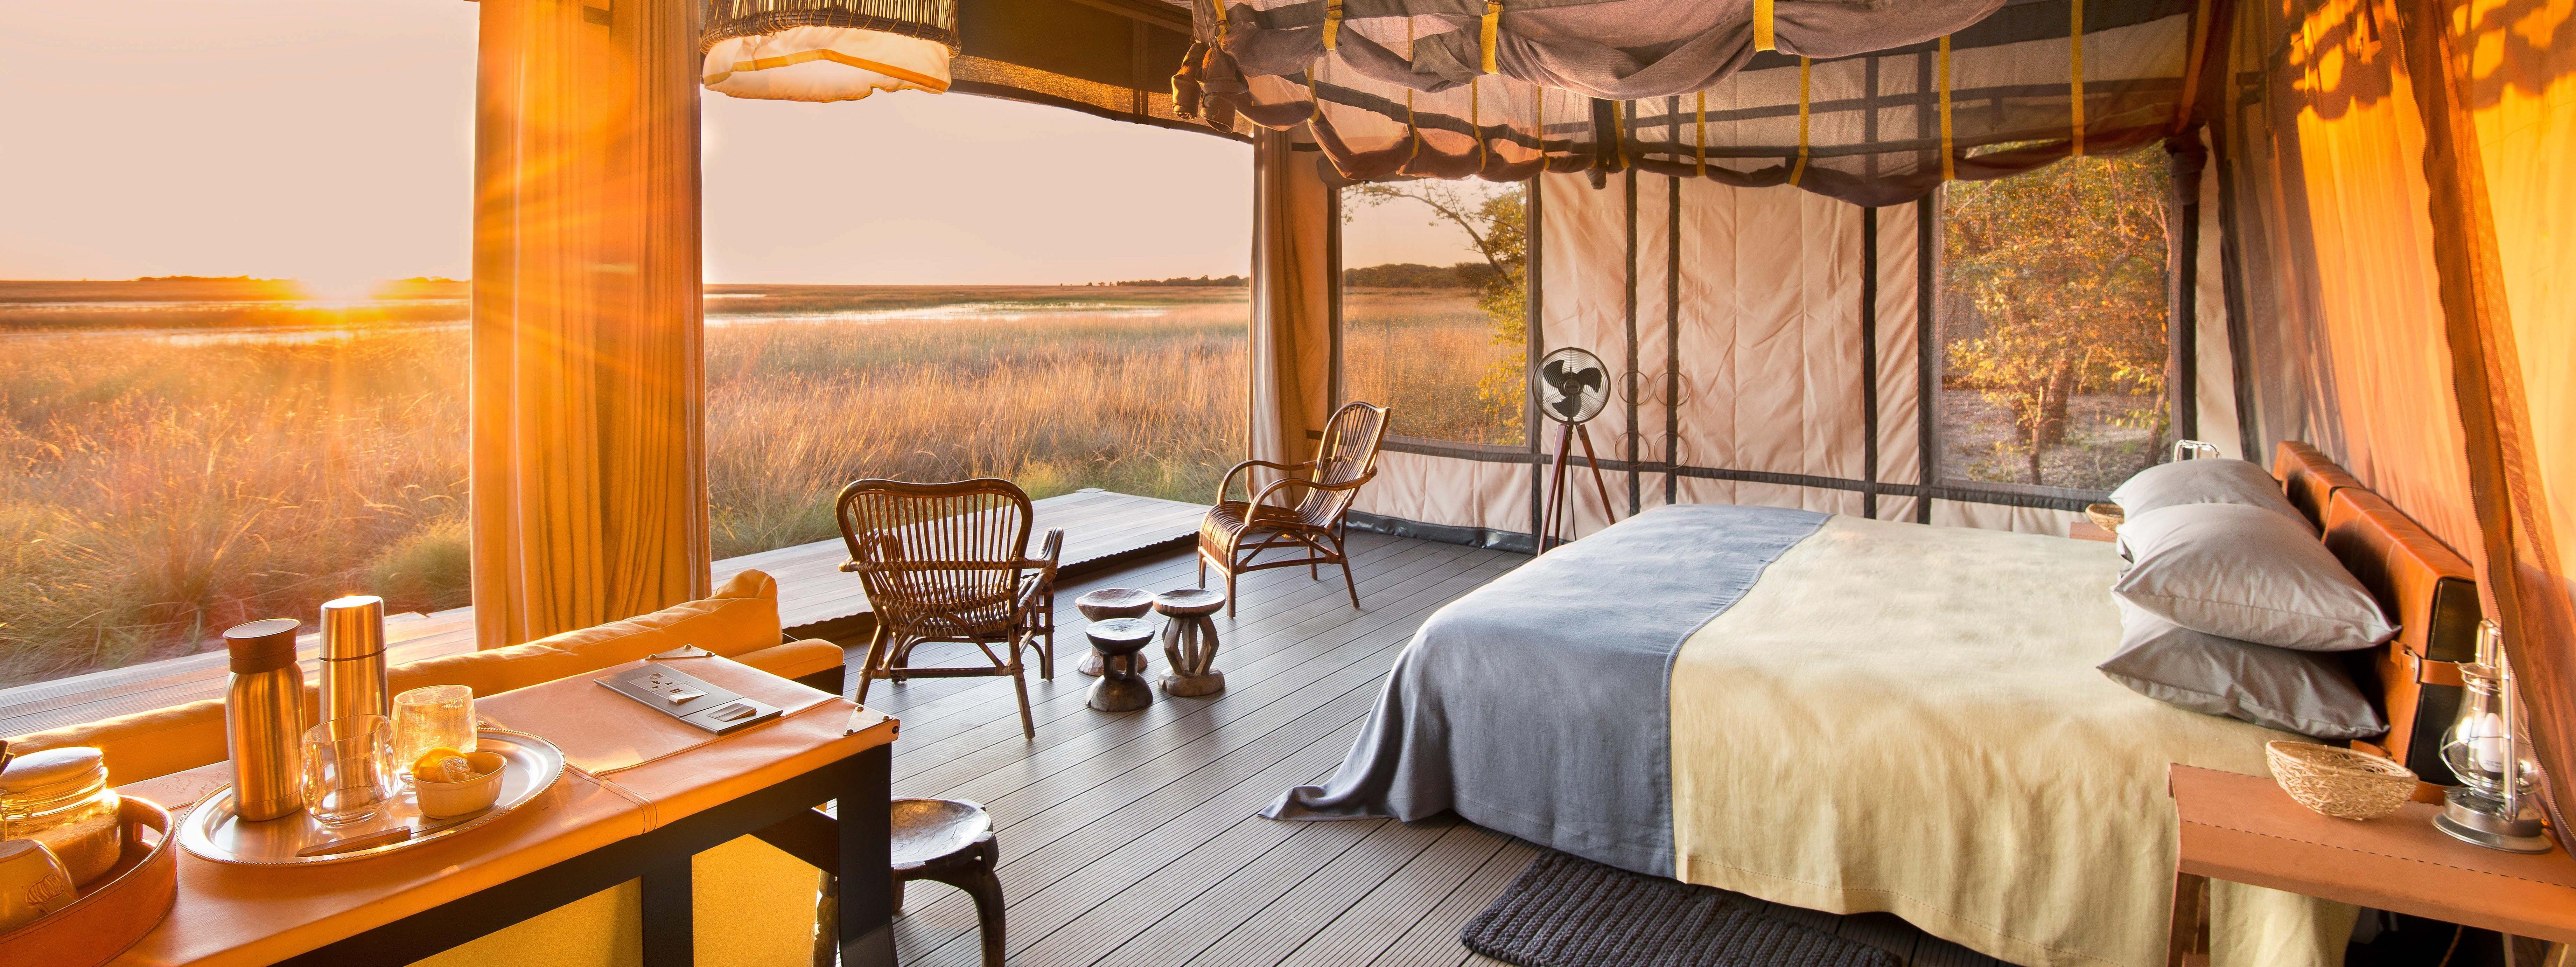 king-lewanika-camp-bedroom